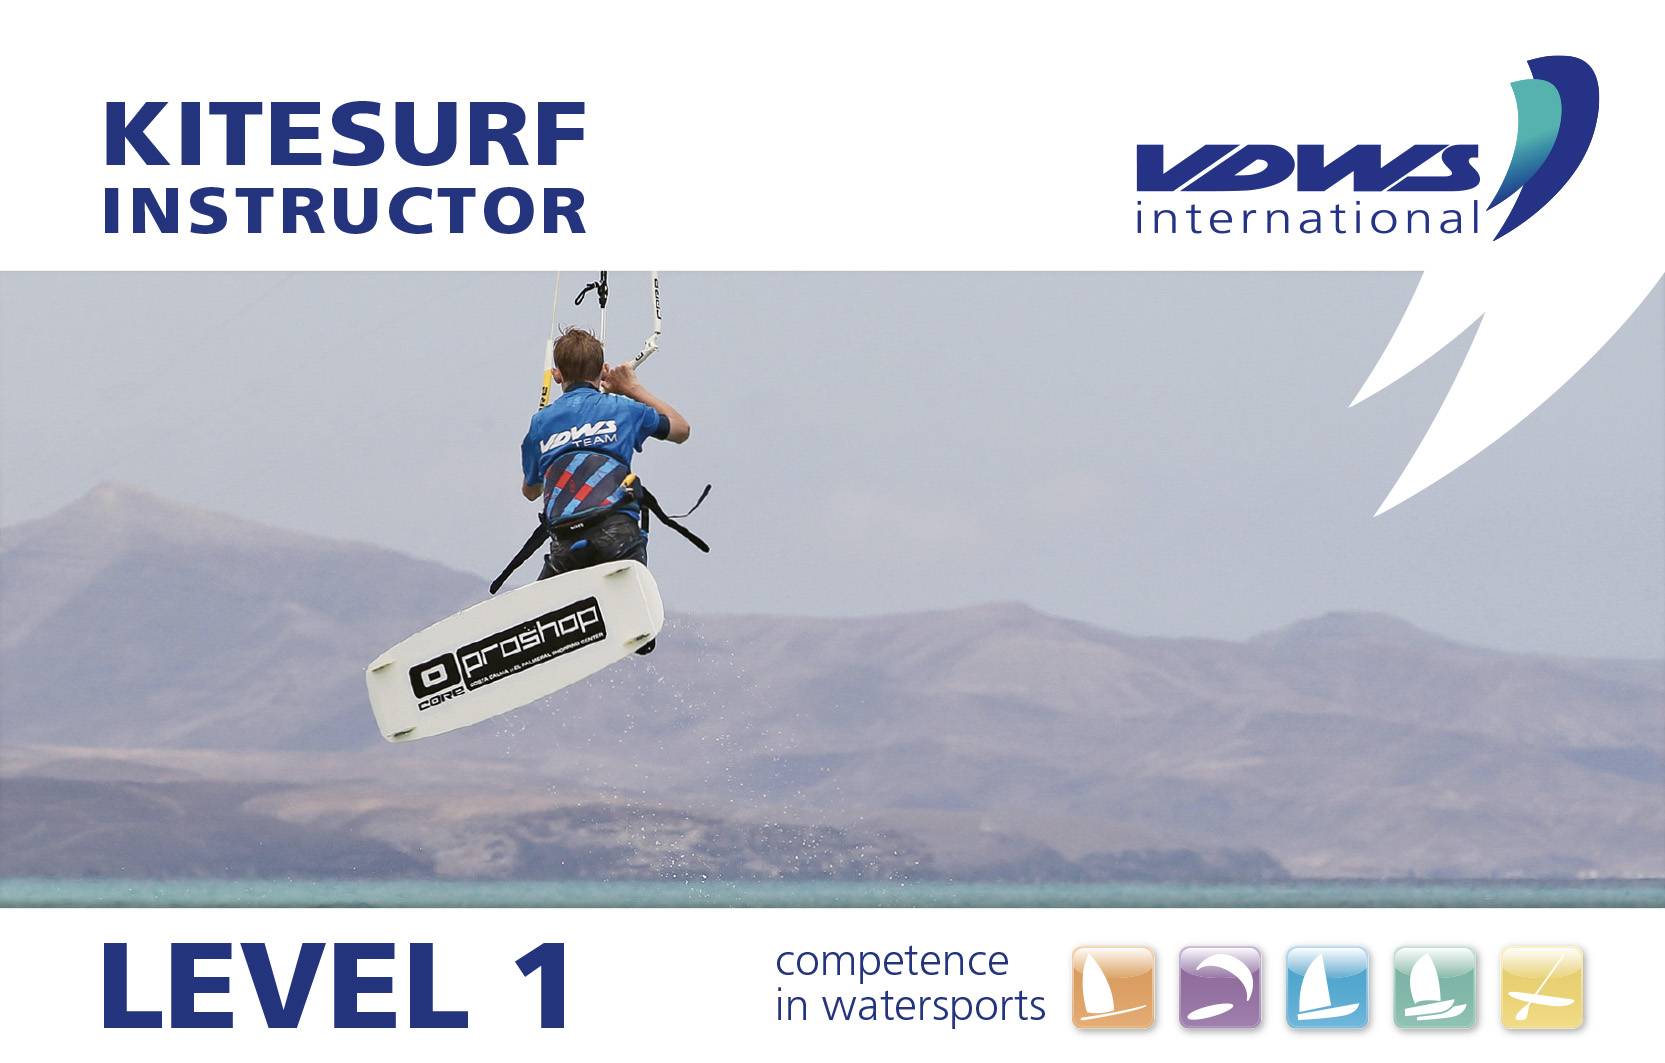 Level 1 Kitesurf Instructor Ausbildung - VDWS